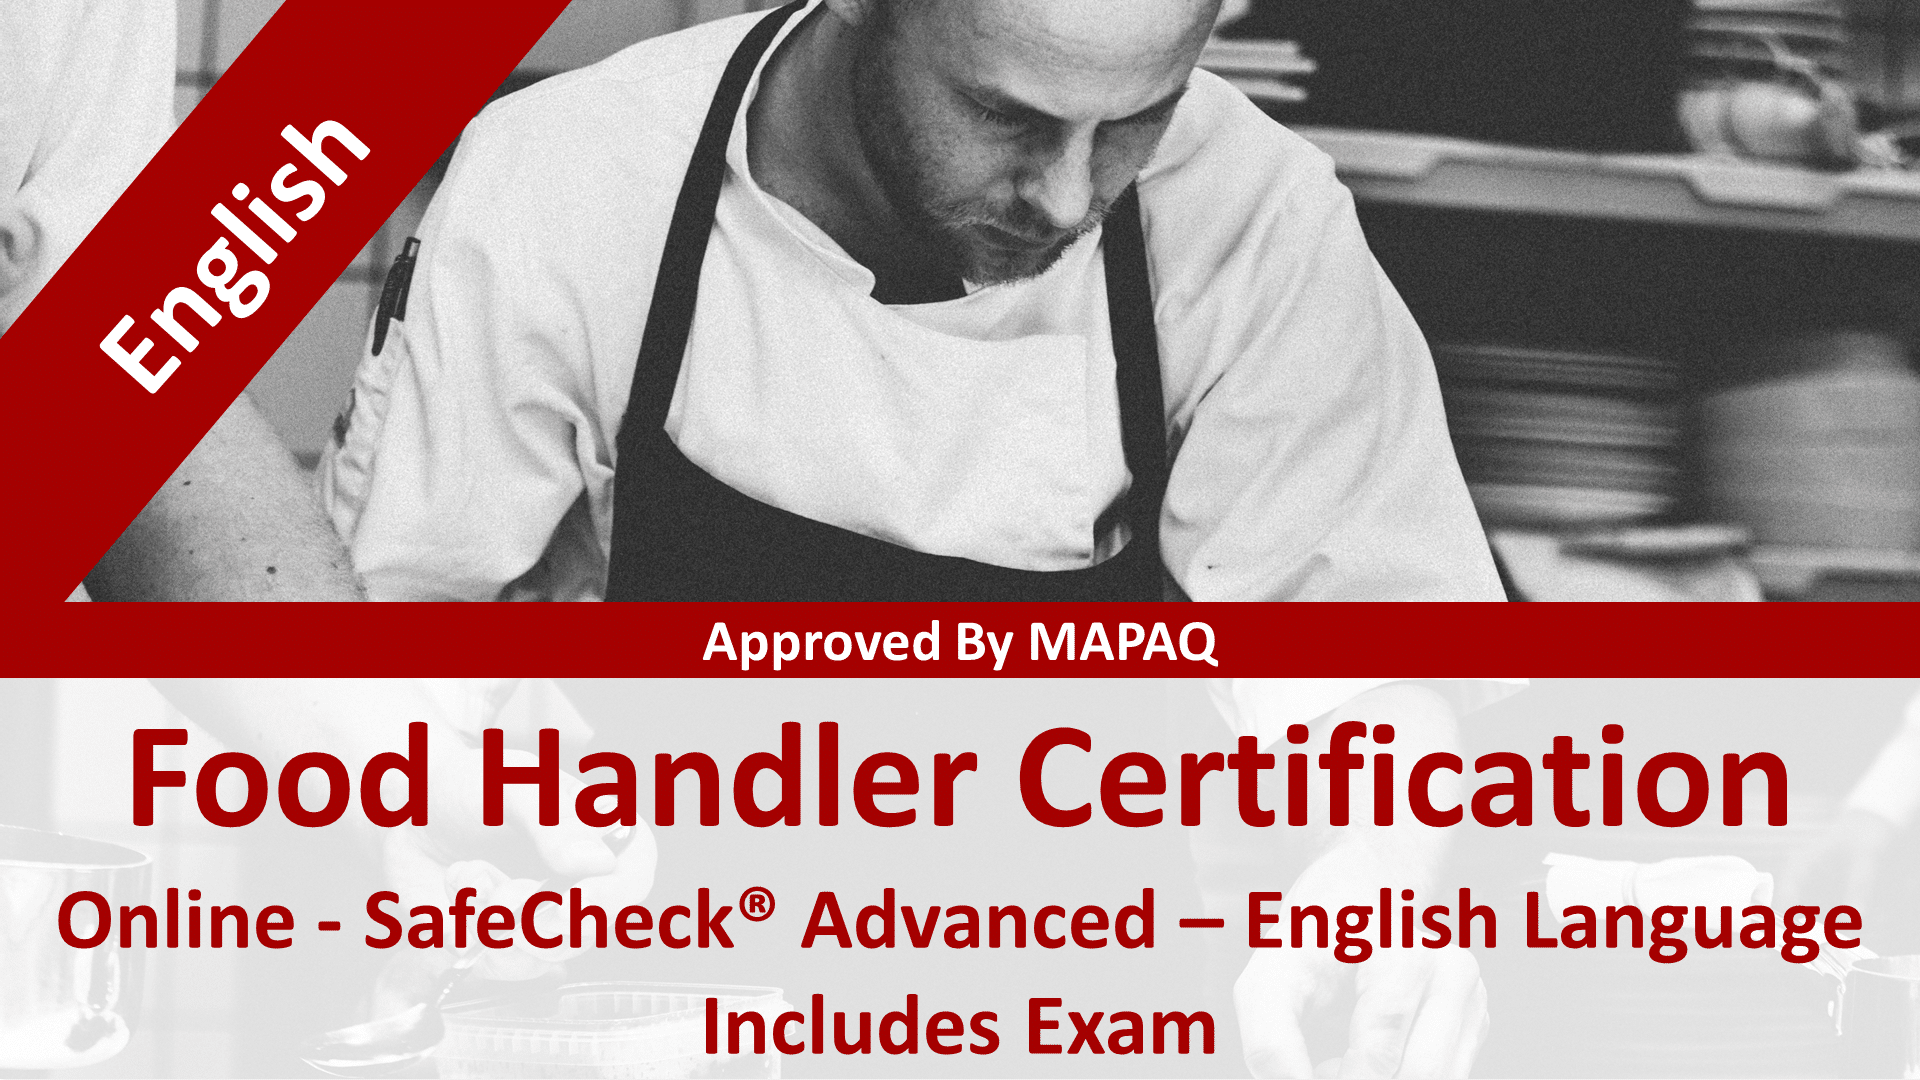 Food Handler Certification - MAPAQ